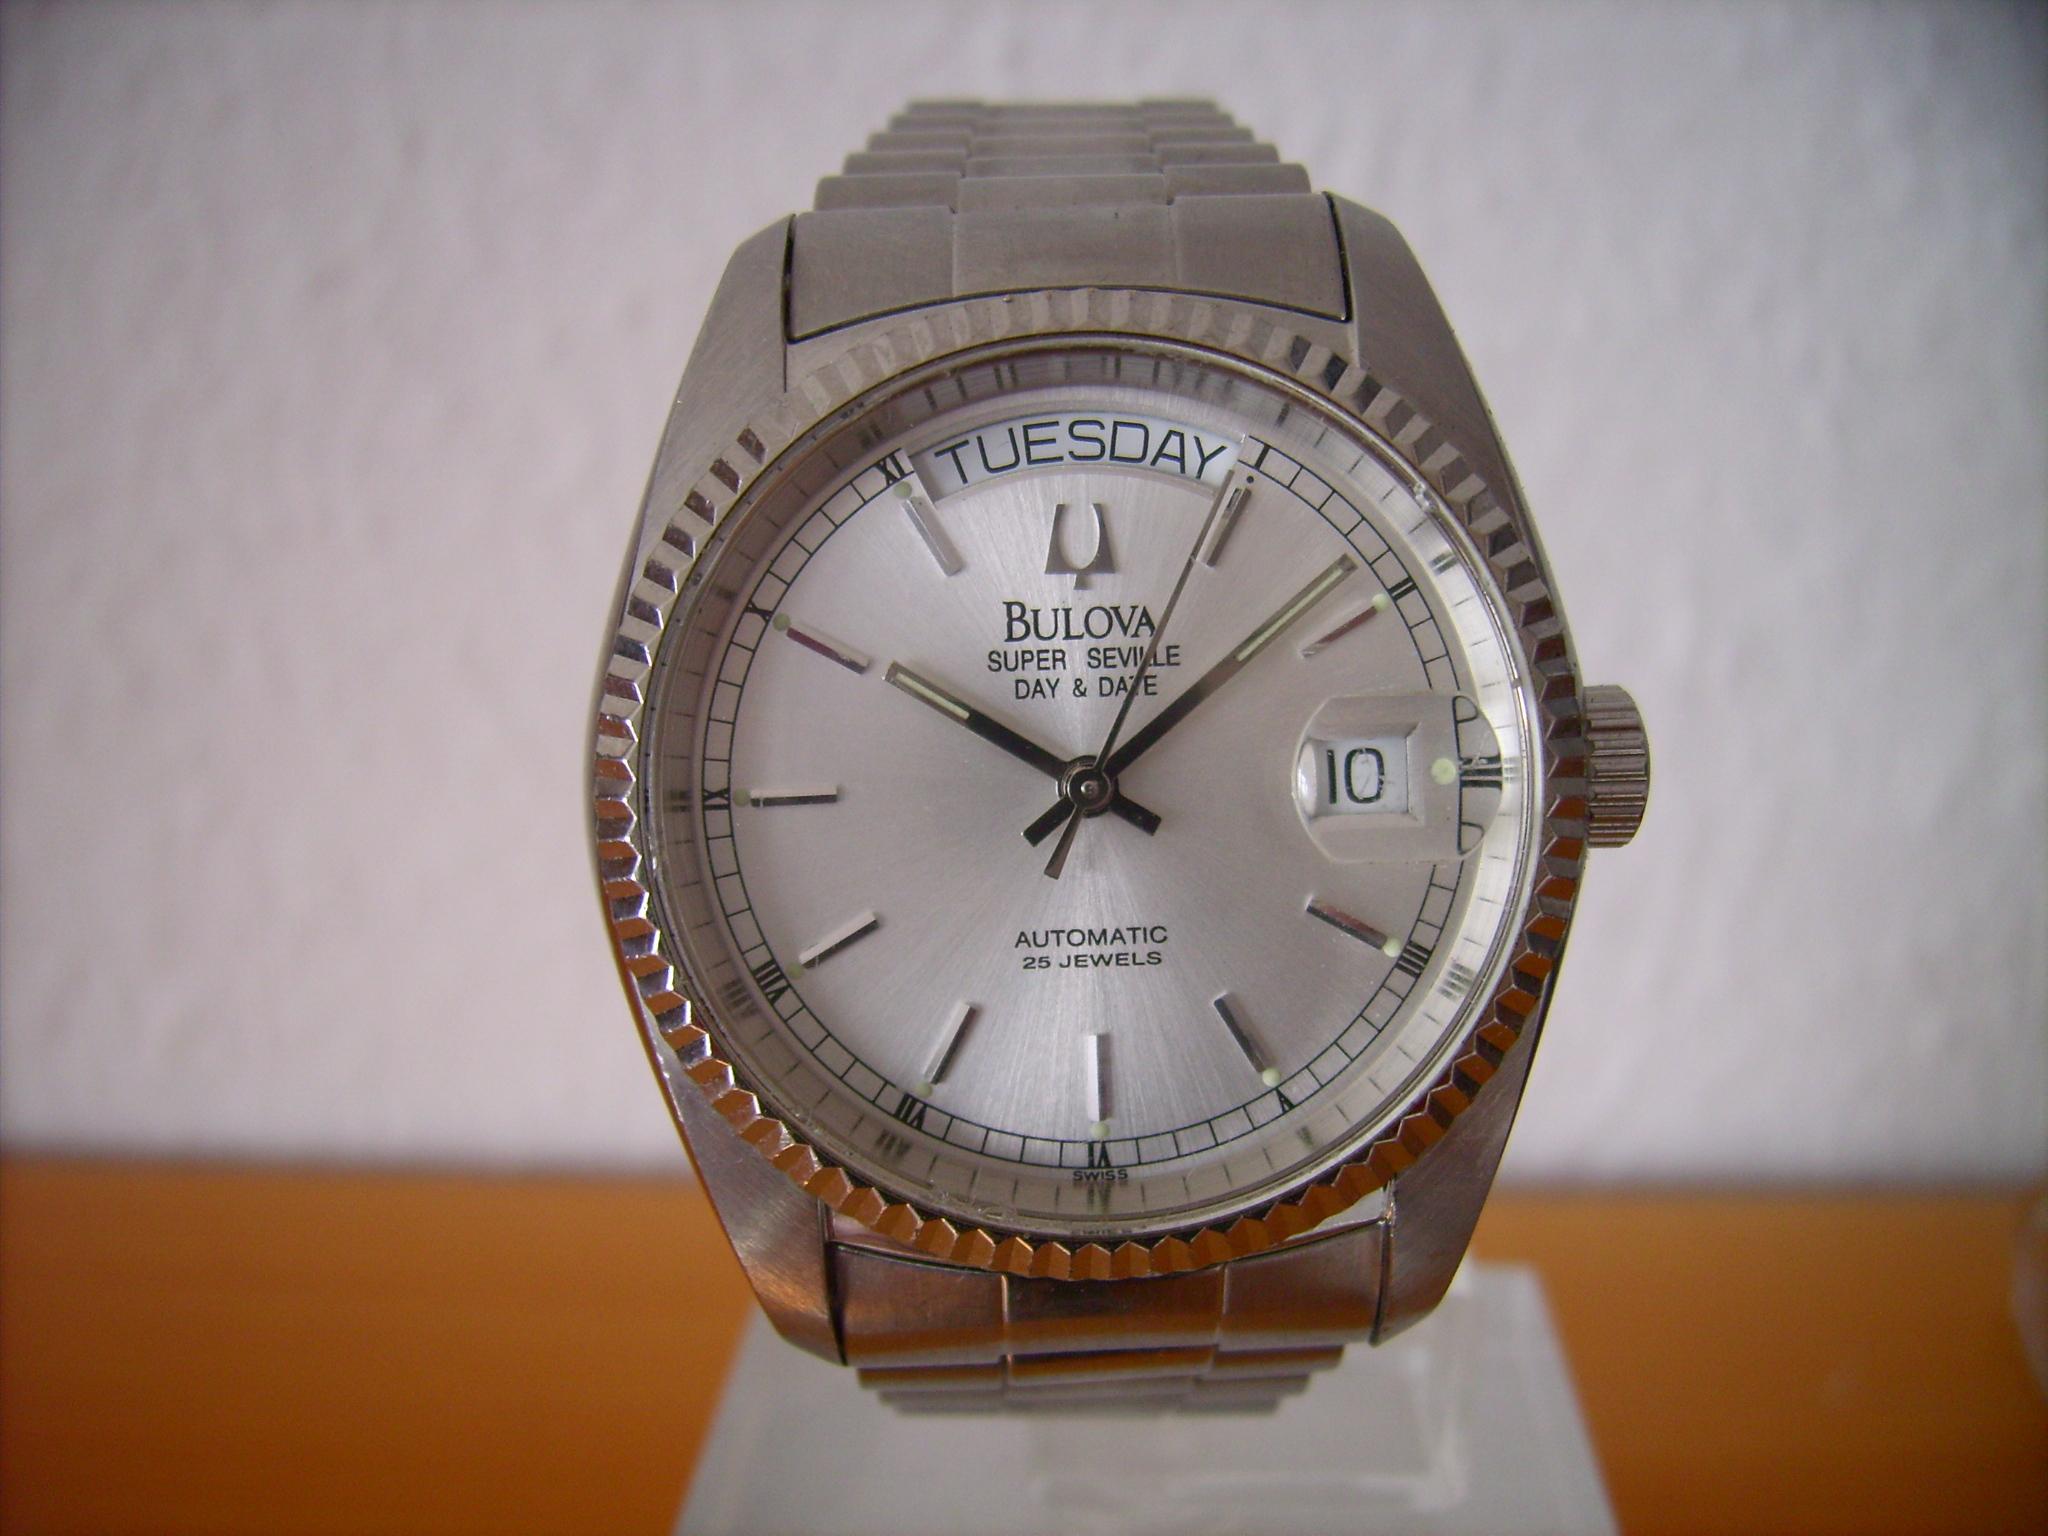 LPIC5007.JPG